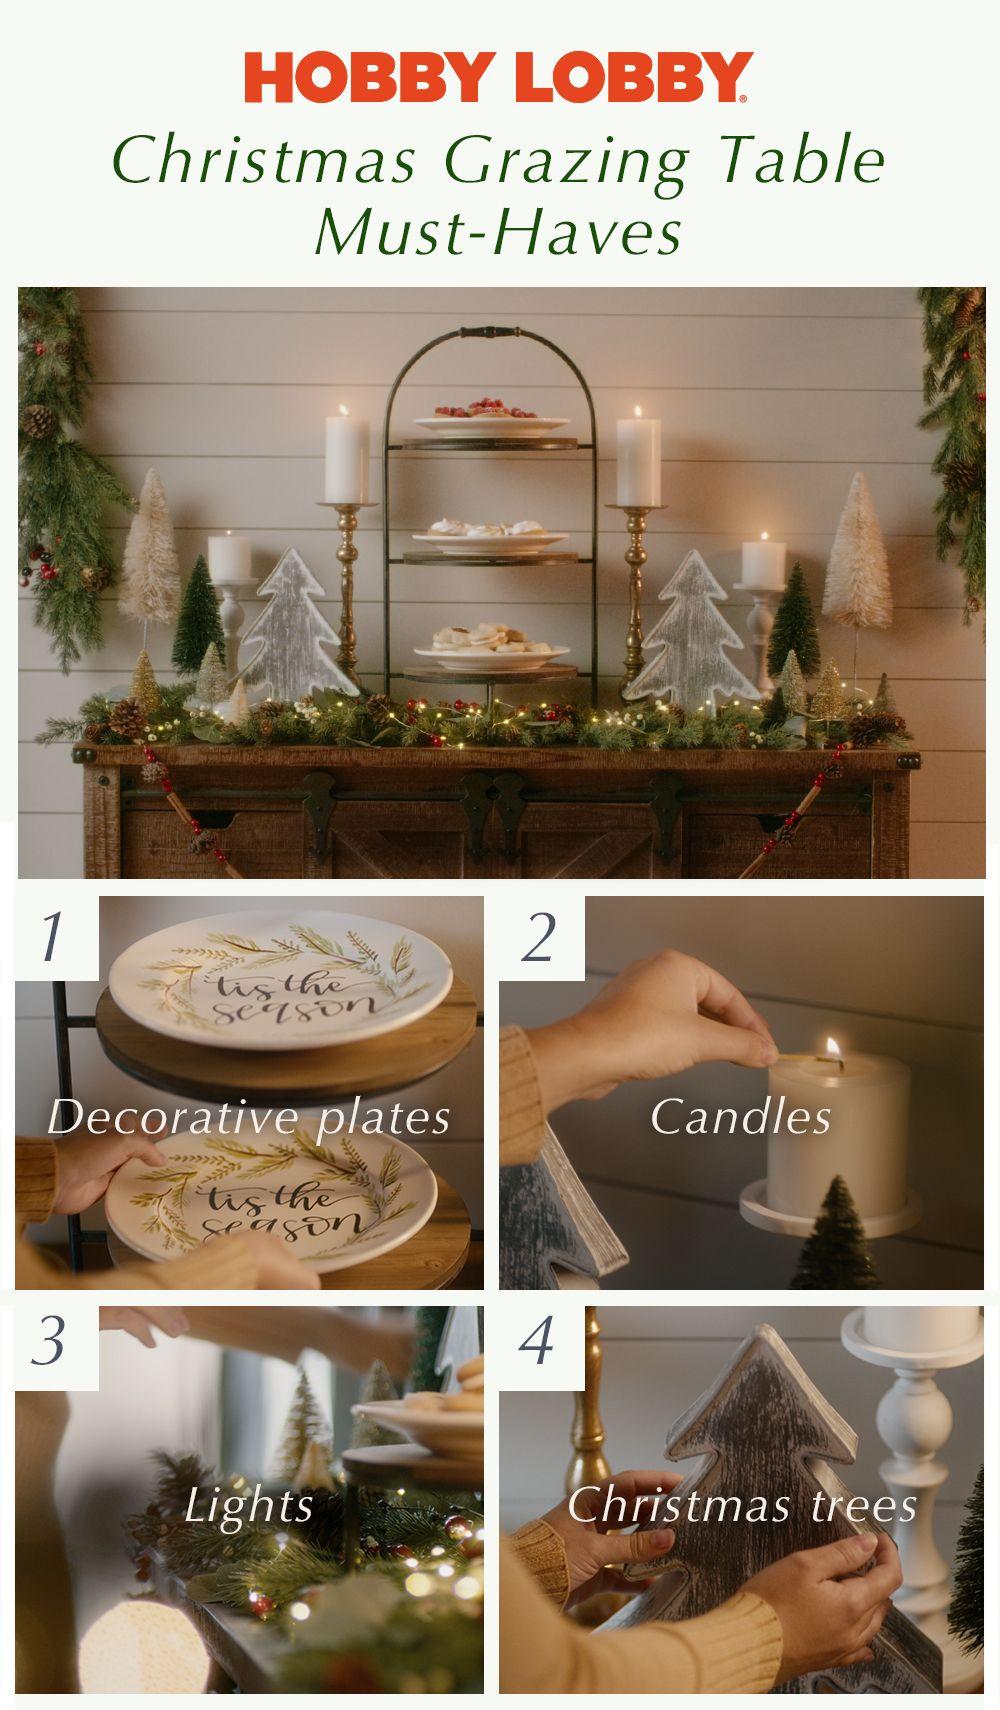 Christmas Grazing Table Must Haves Christmas Entertaining Christmas Diy Christmas Decorations